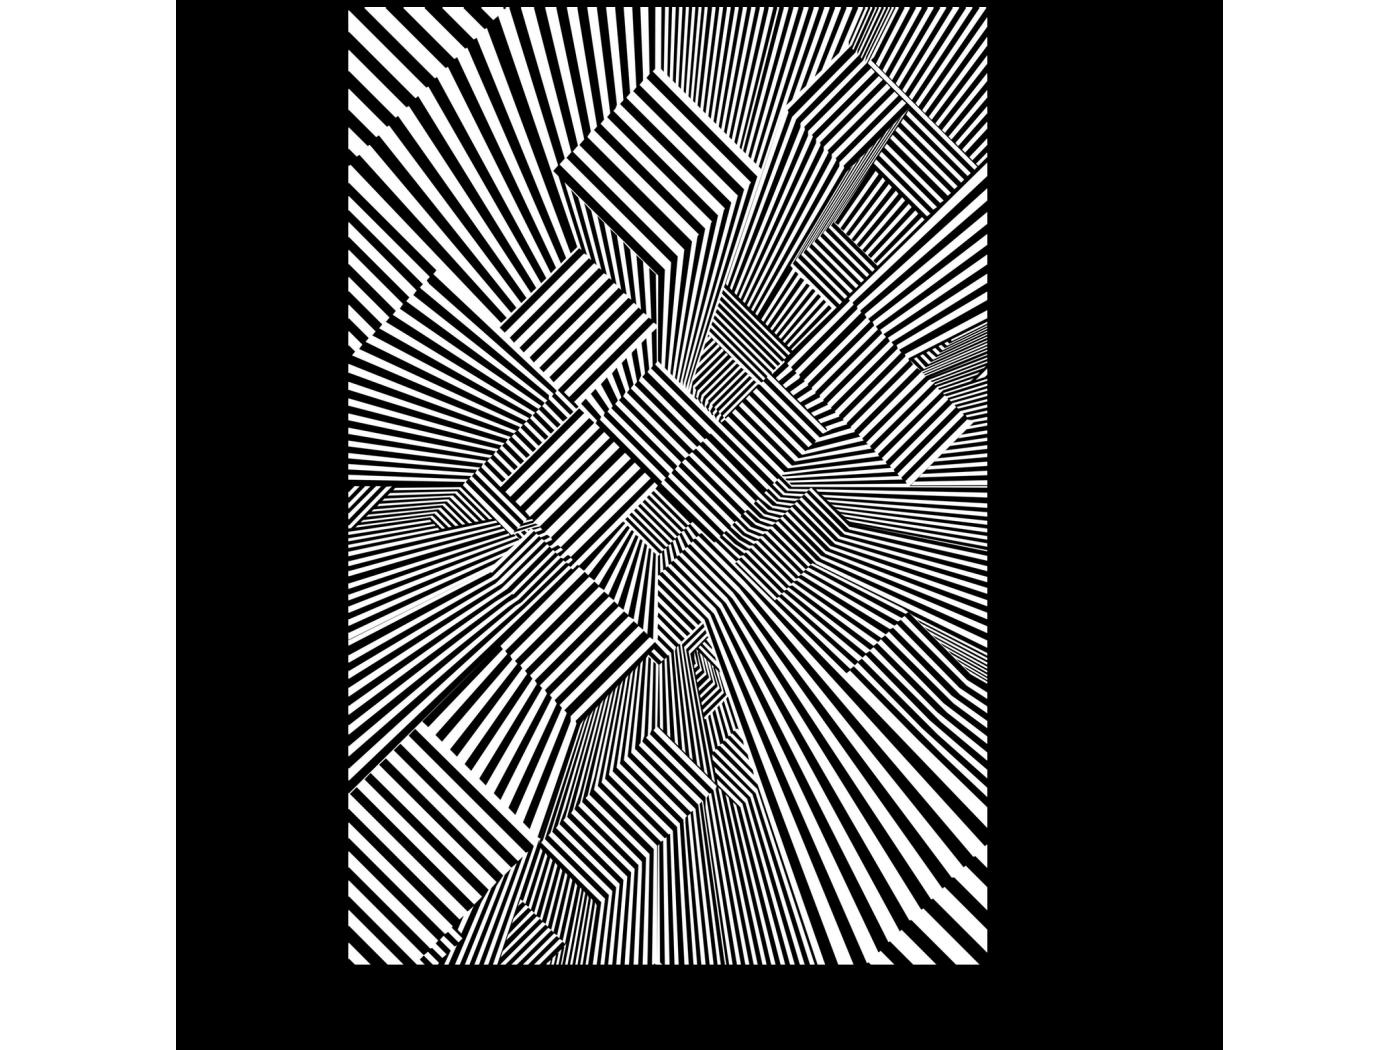 Модульная картина Трехмерный лабиринт (20x30) фото